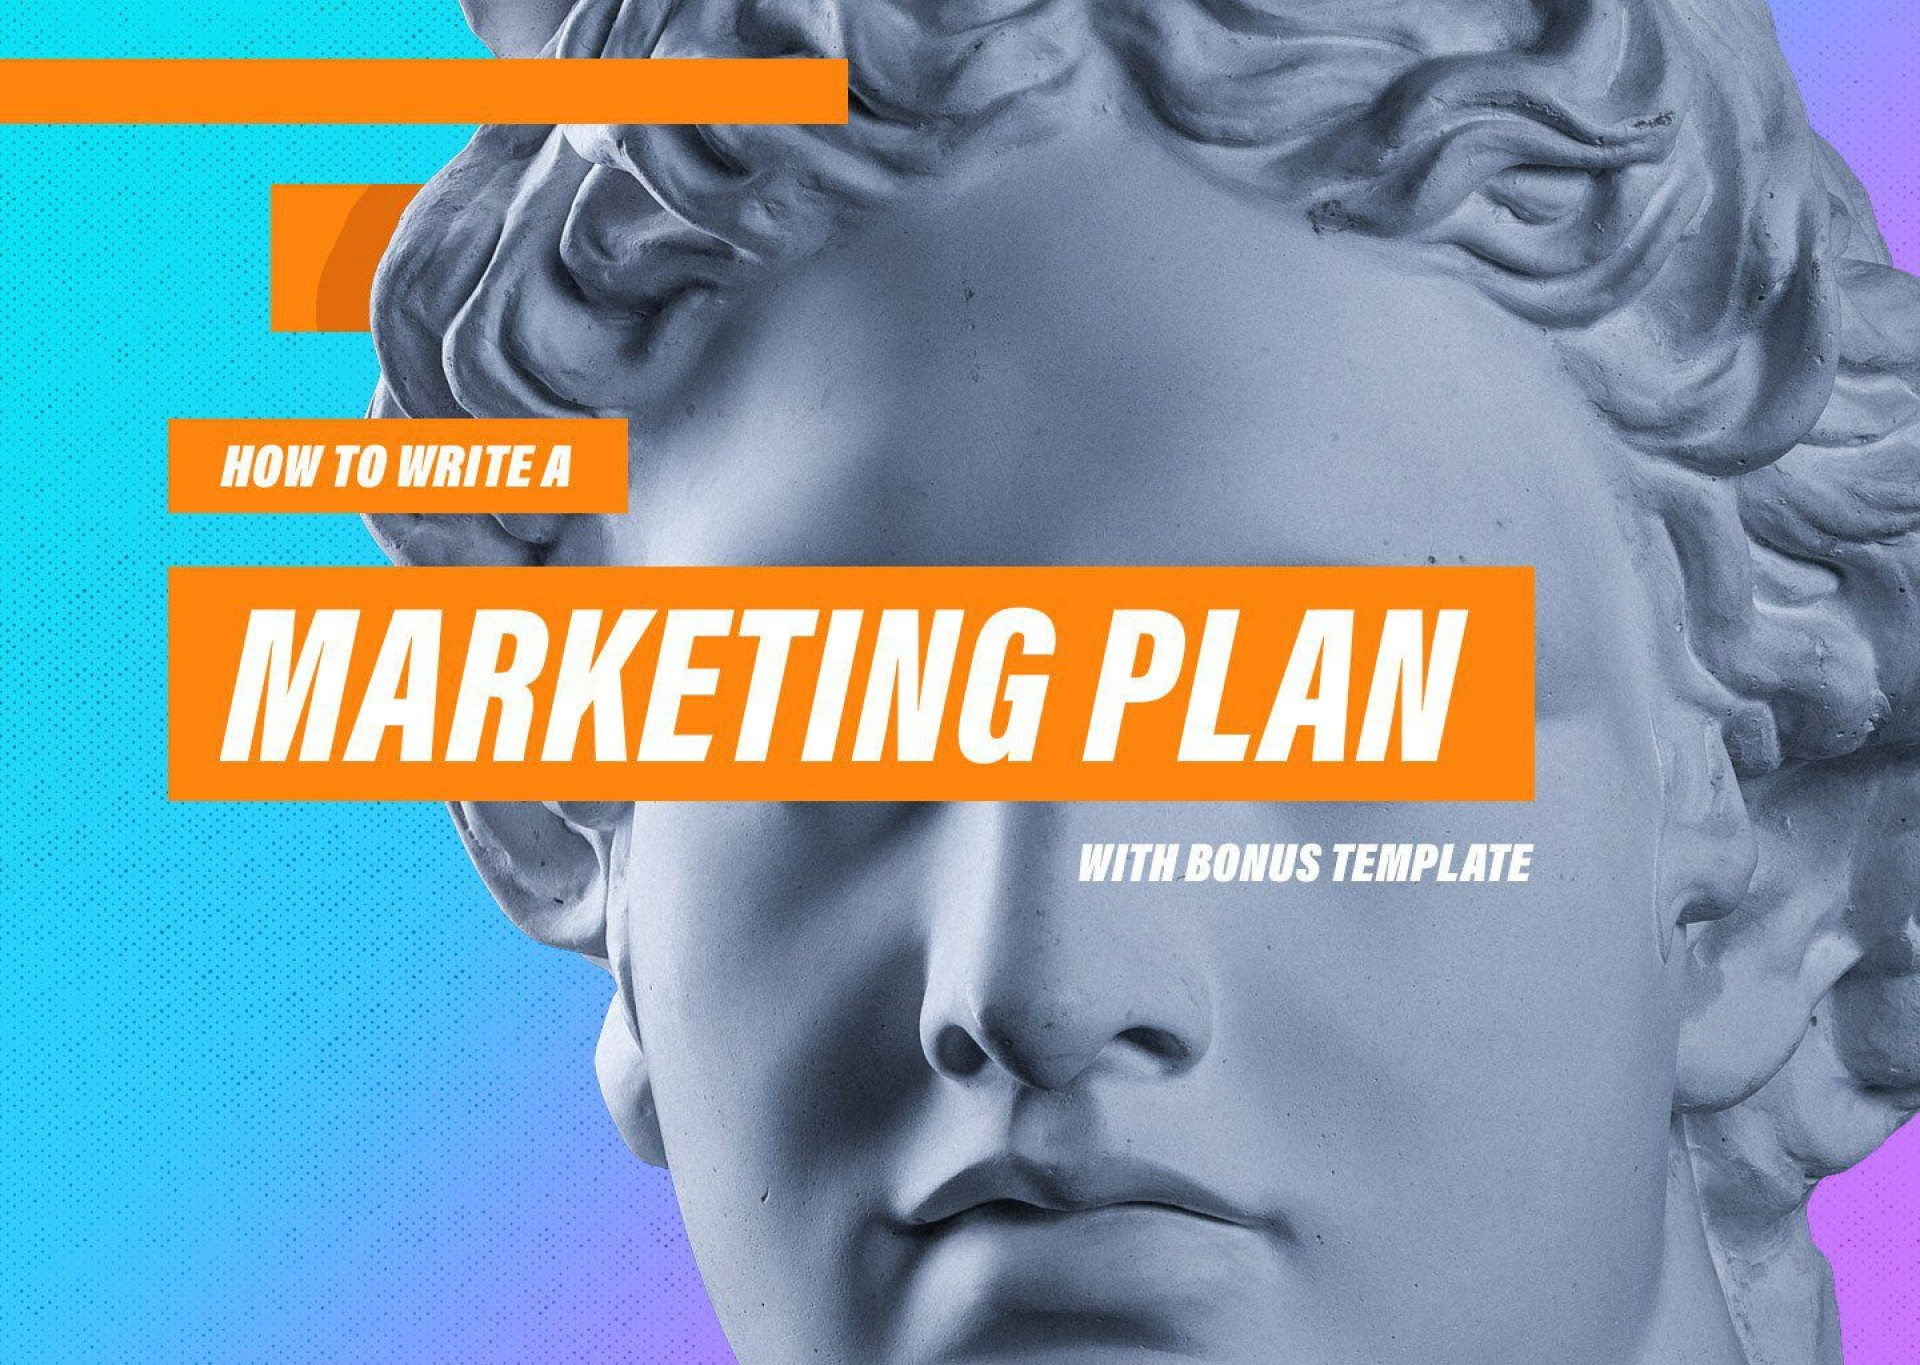 006 Sensational Product Launch Marketing Plan Template Free High Resolution 1920